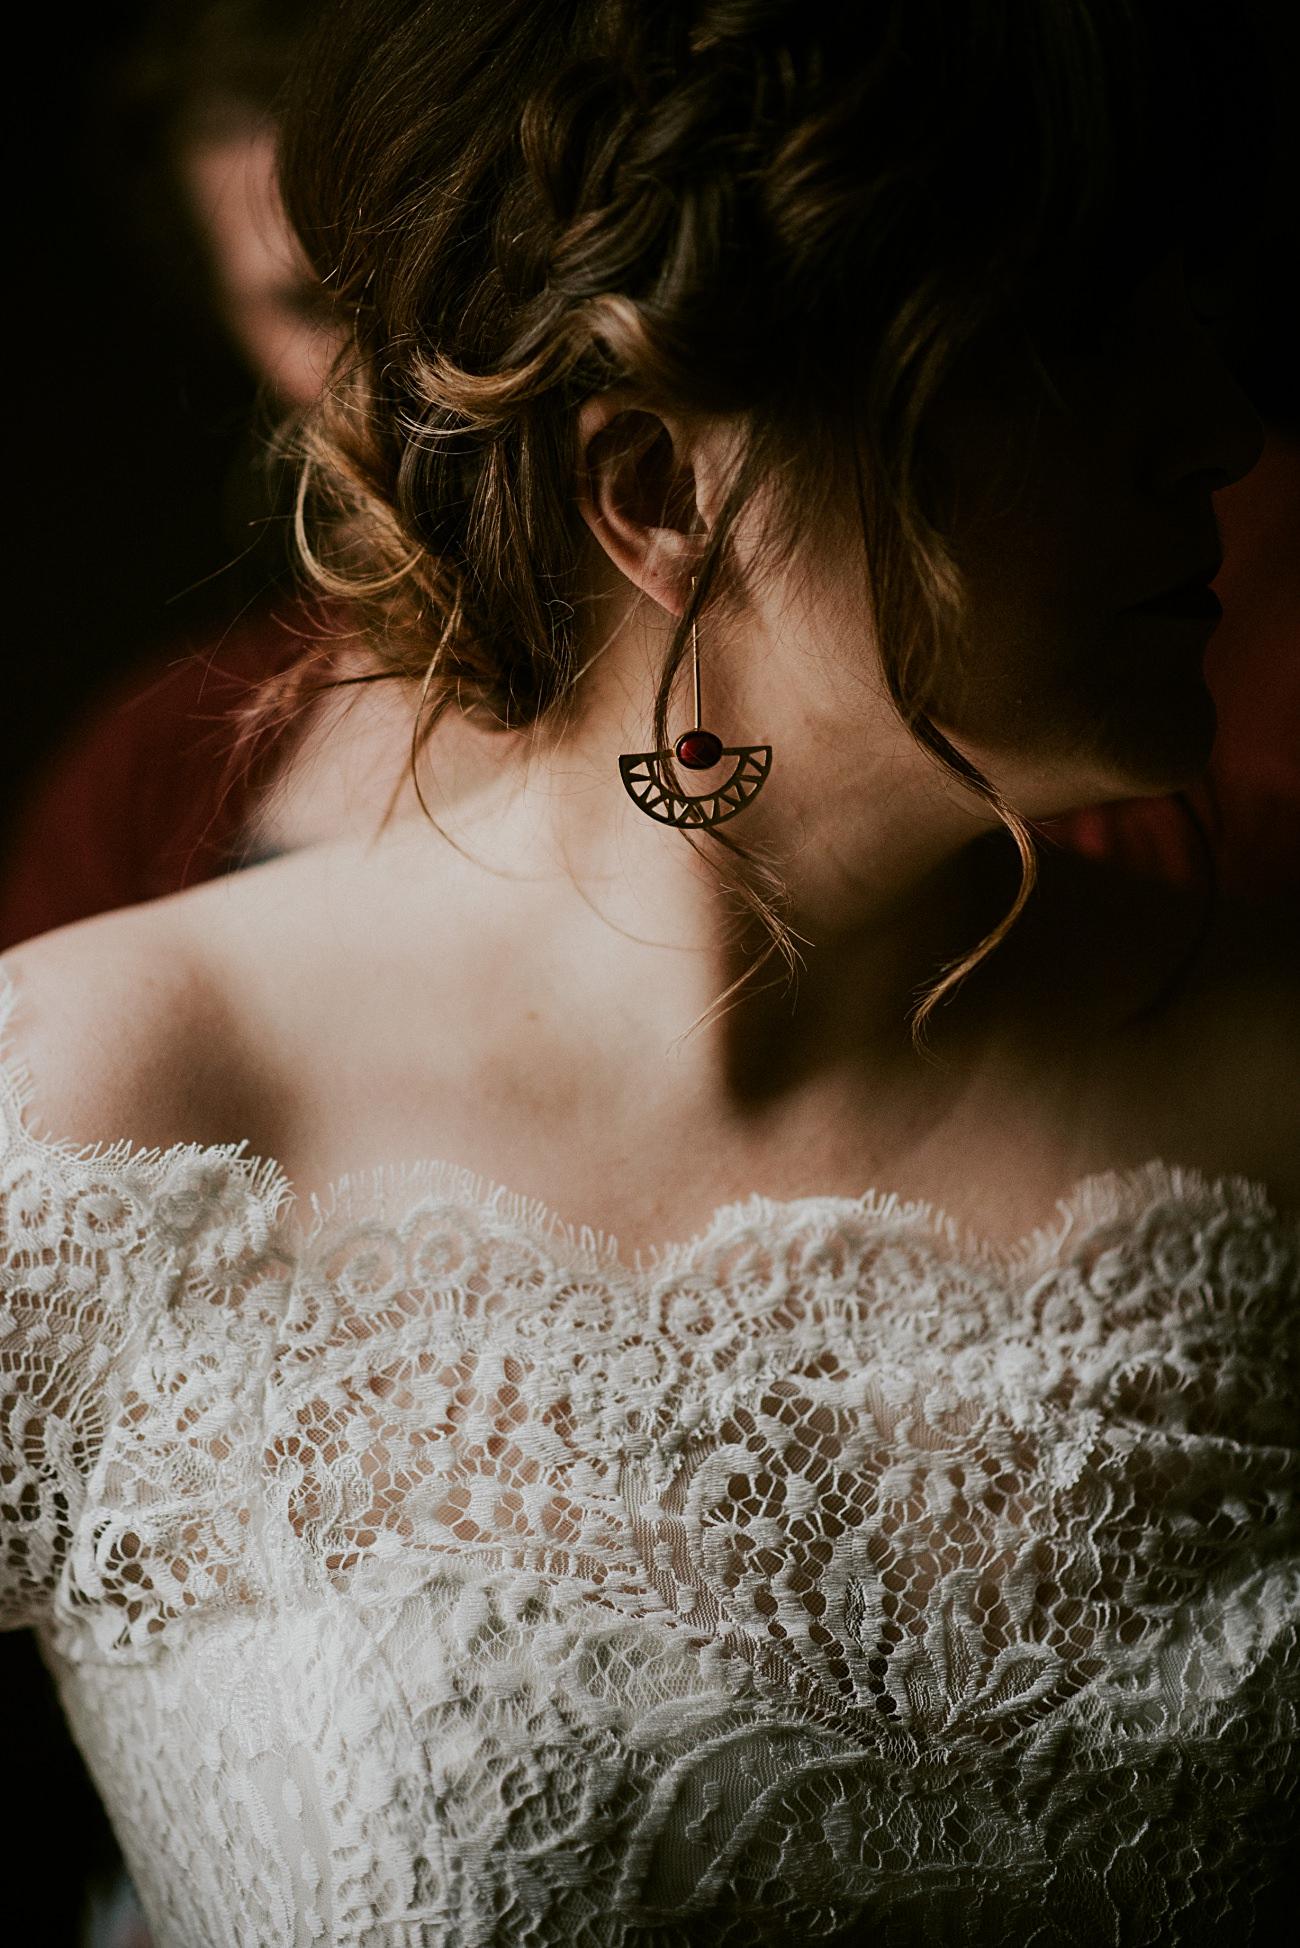 First Look, Winter Wedding, Lageret Wedding in Stoughton Wisconsin, Fall Wedding, Madison WI Wedding, Industrial Wedding, Moody Wedding, floral bridesmaid dress,